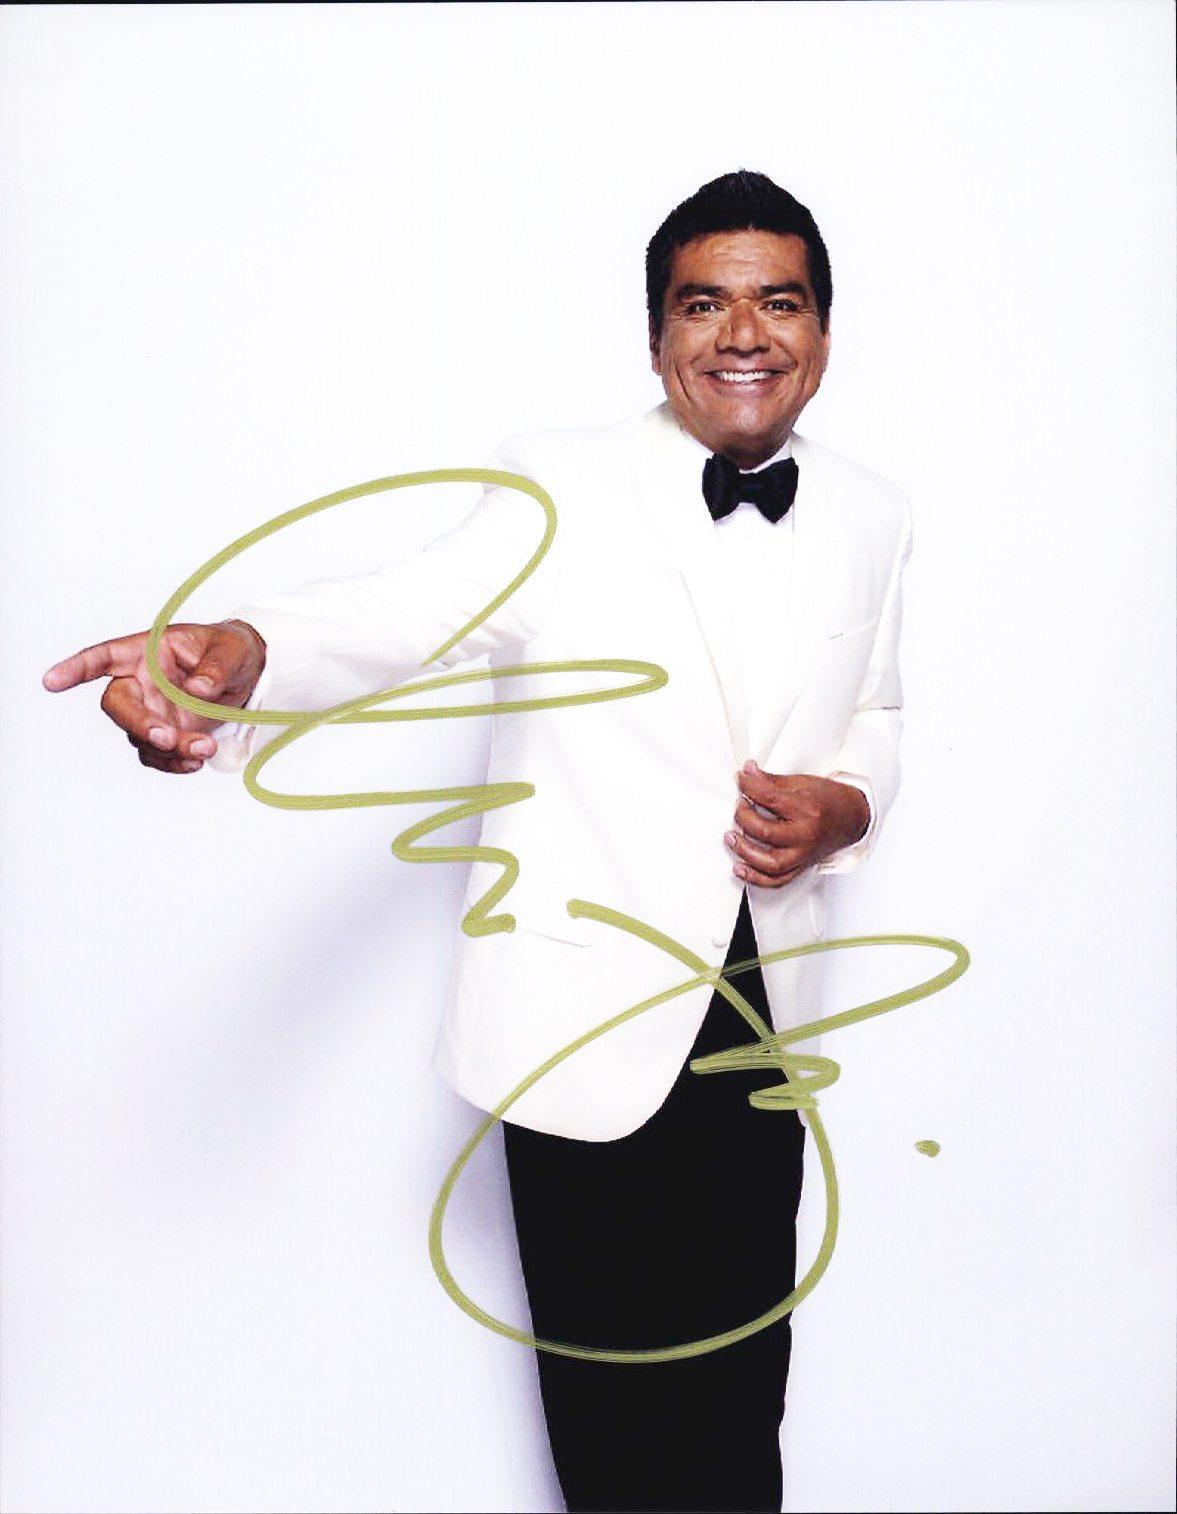 Pink Autograph | eBay